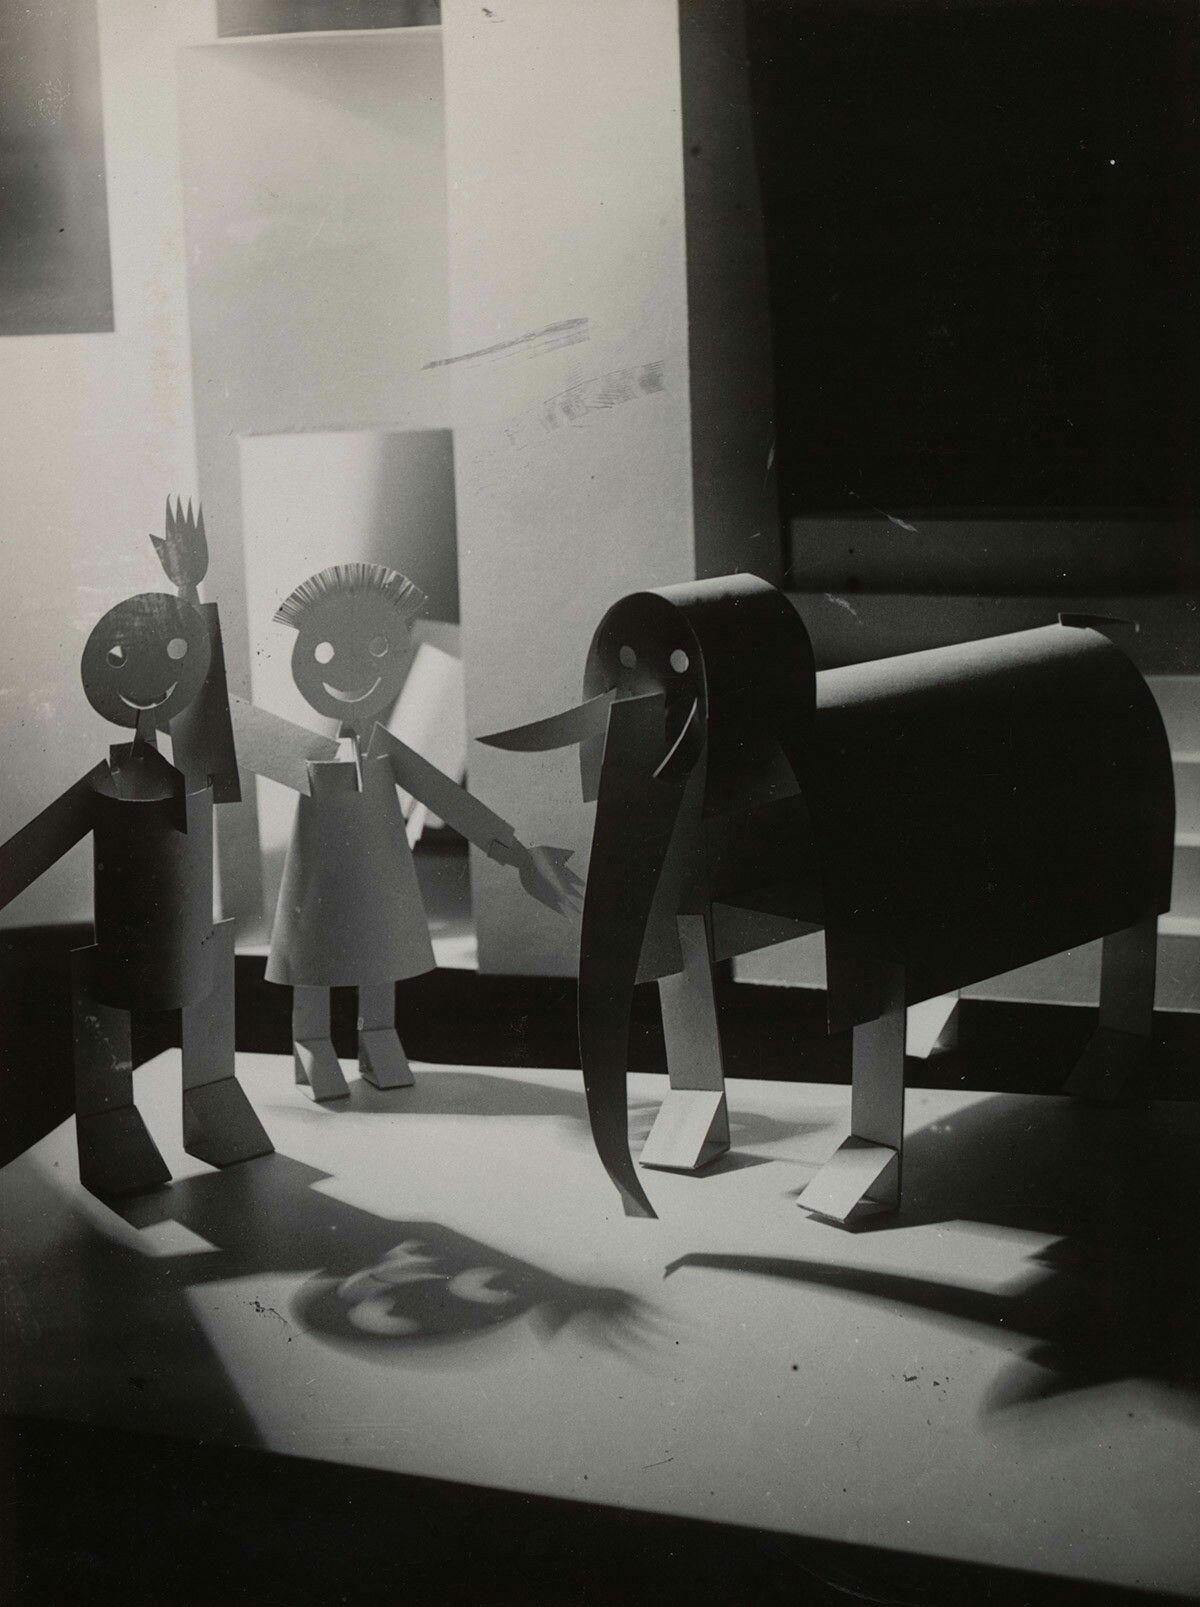 Favores Por Elsa Rodriguez En The Light The Dark And The Gloom